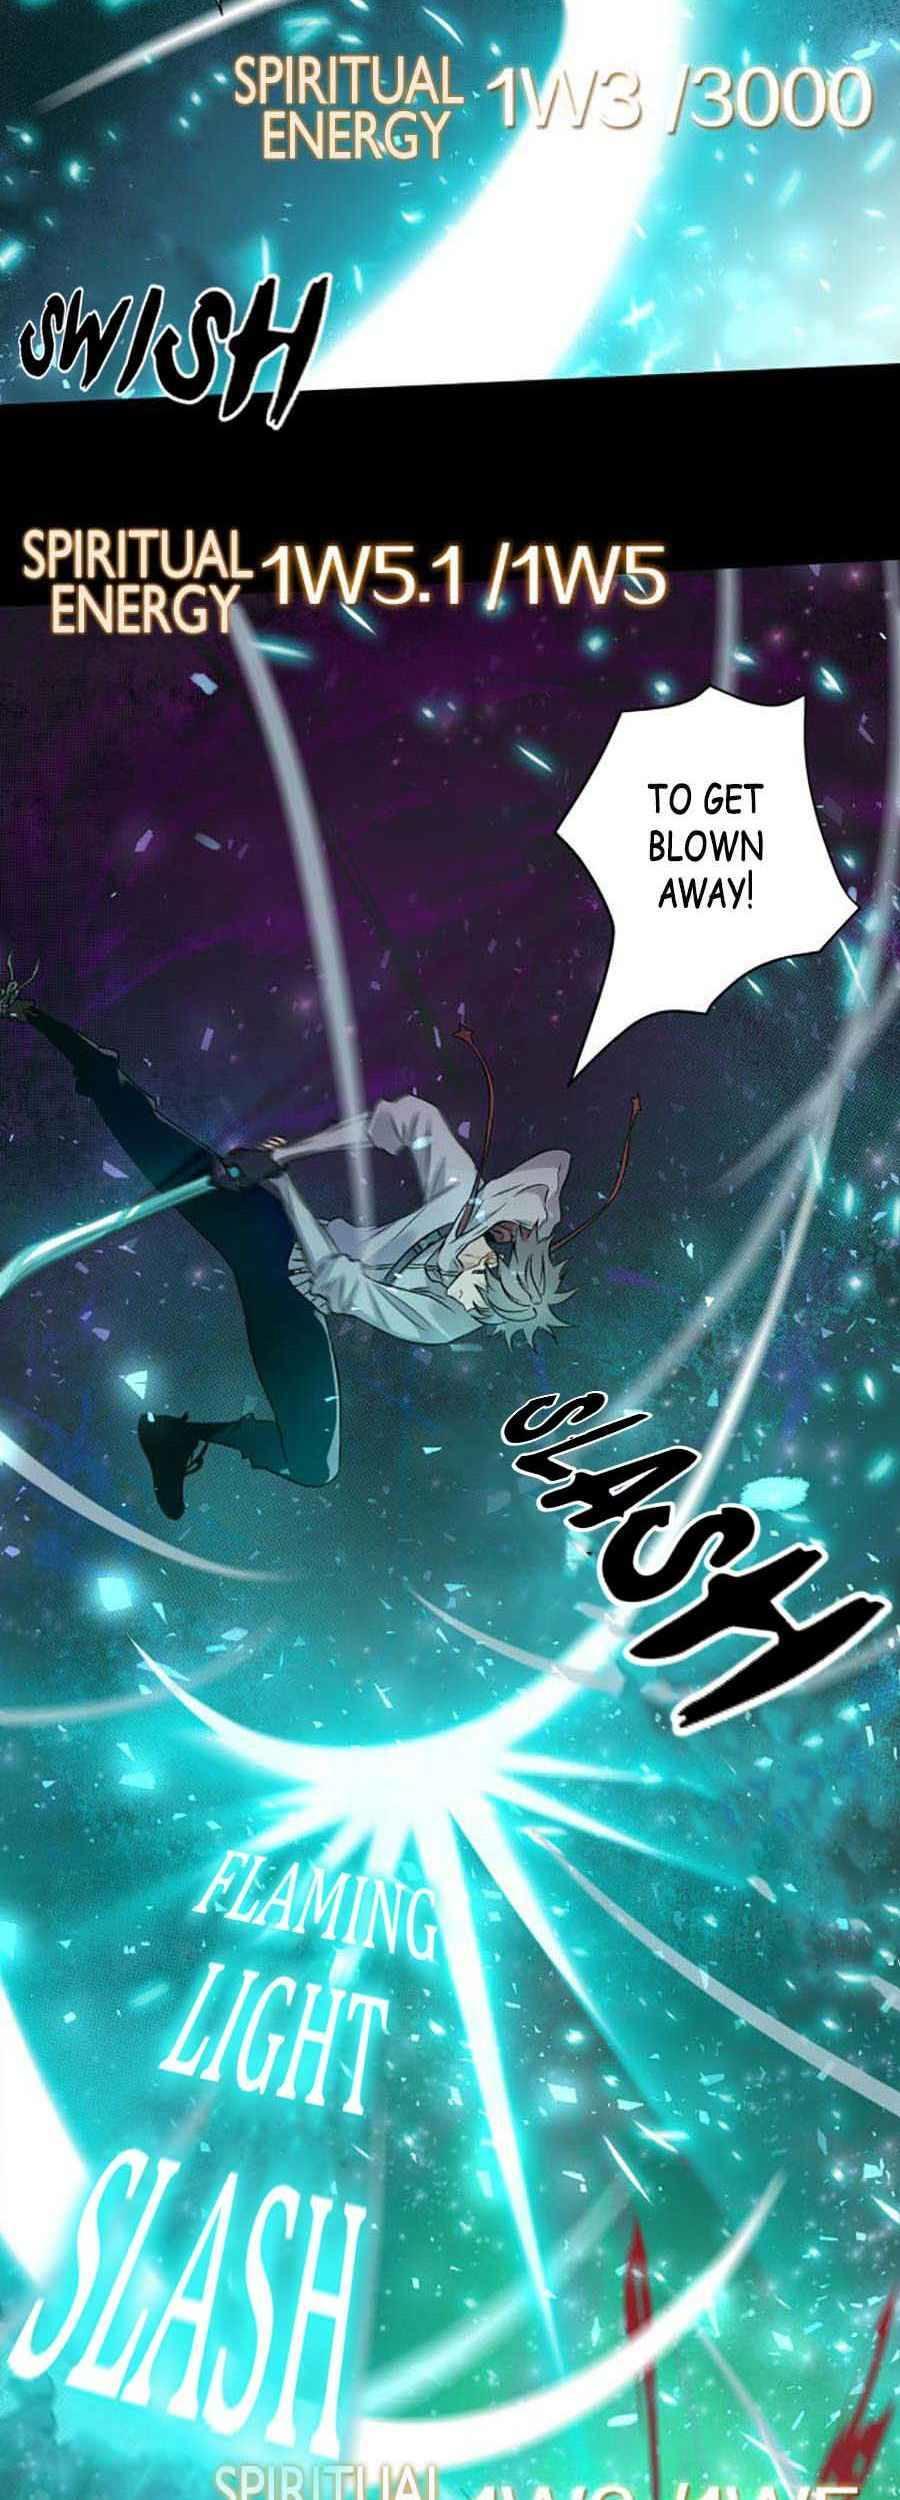 Take The Crown, I Want To Be A King Chapter 23 page 27 - Mangakakalots.com